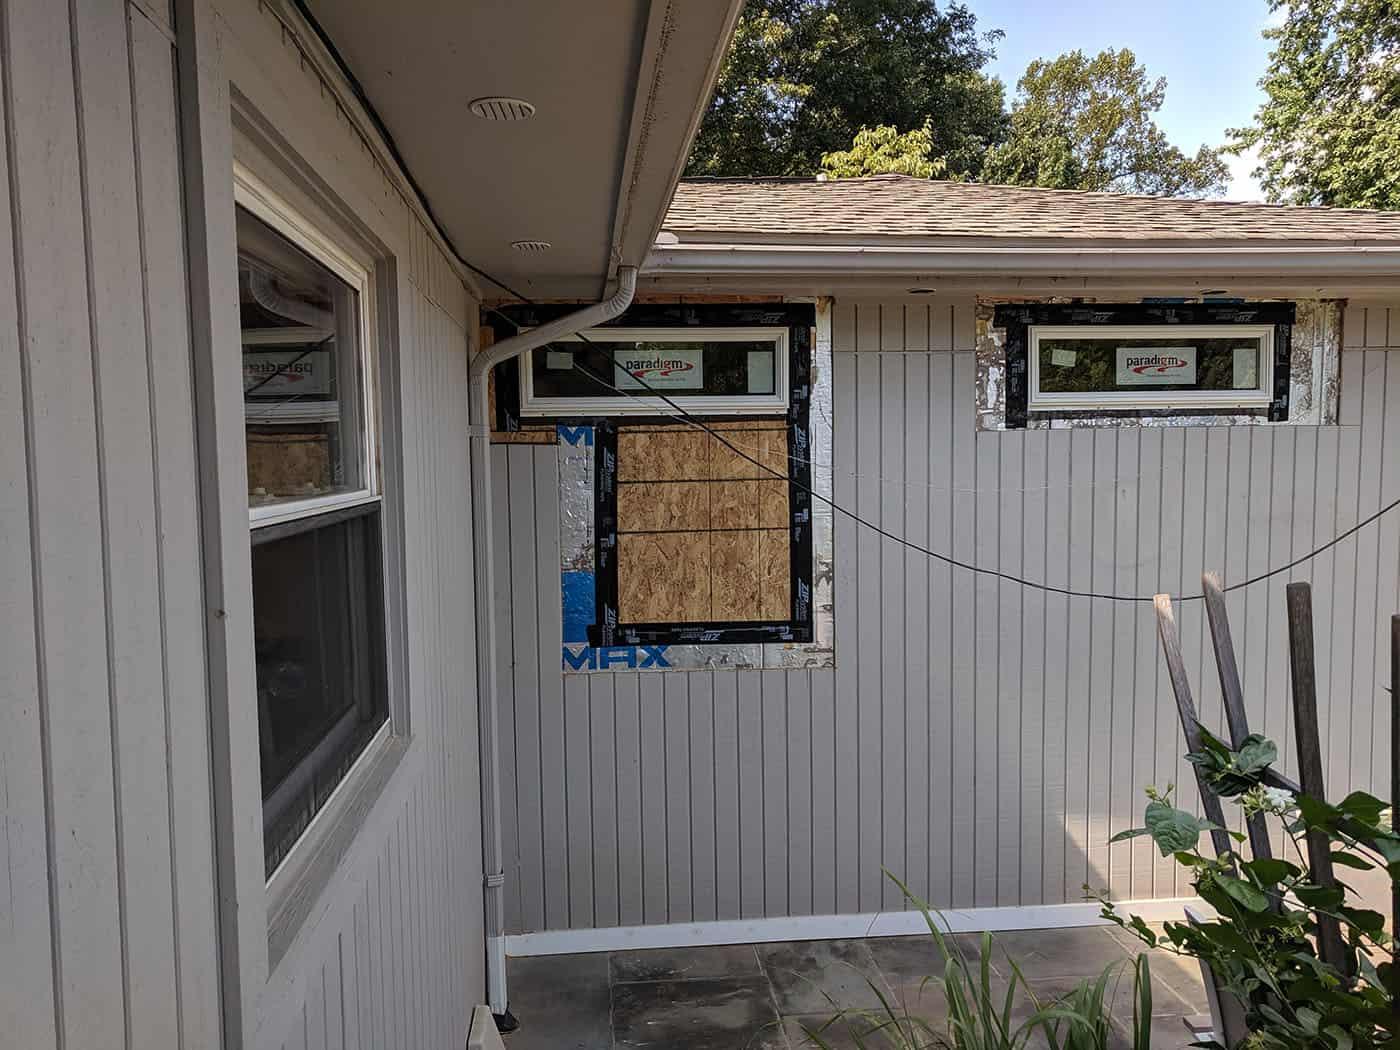 Transom windows: During